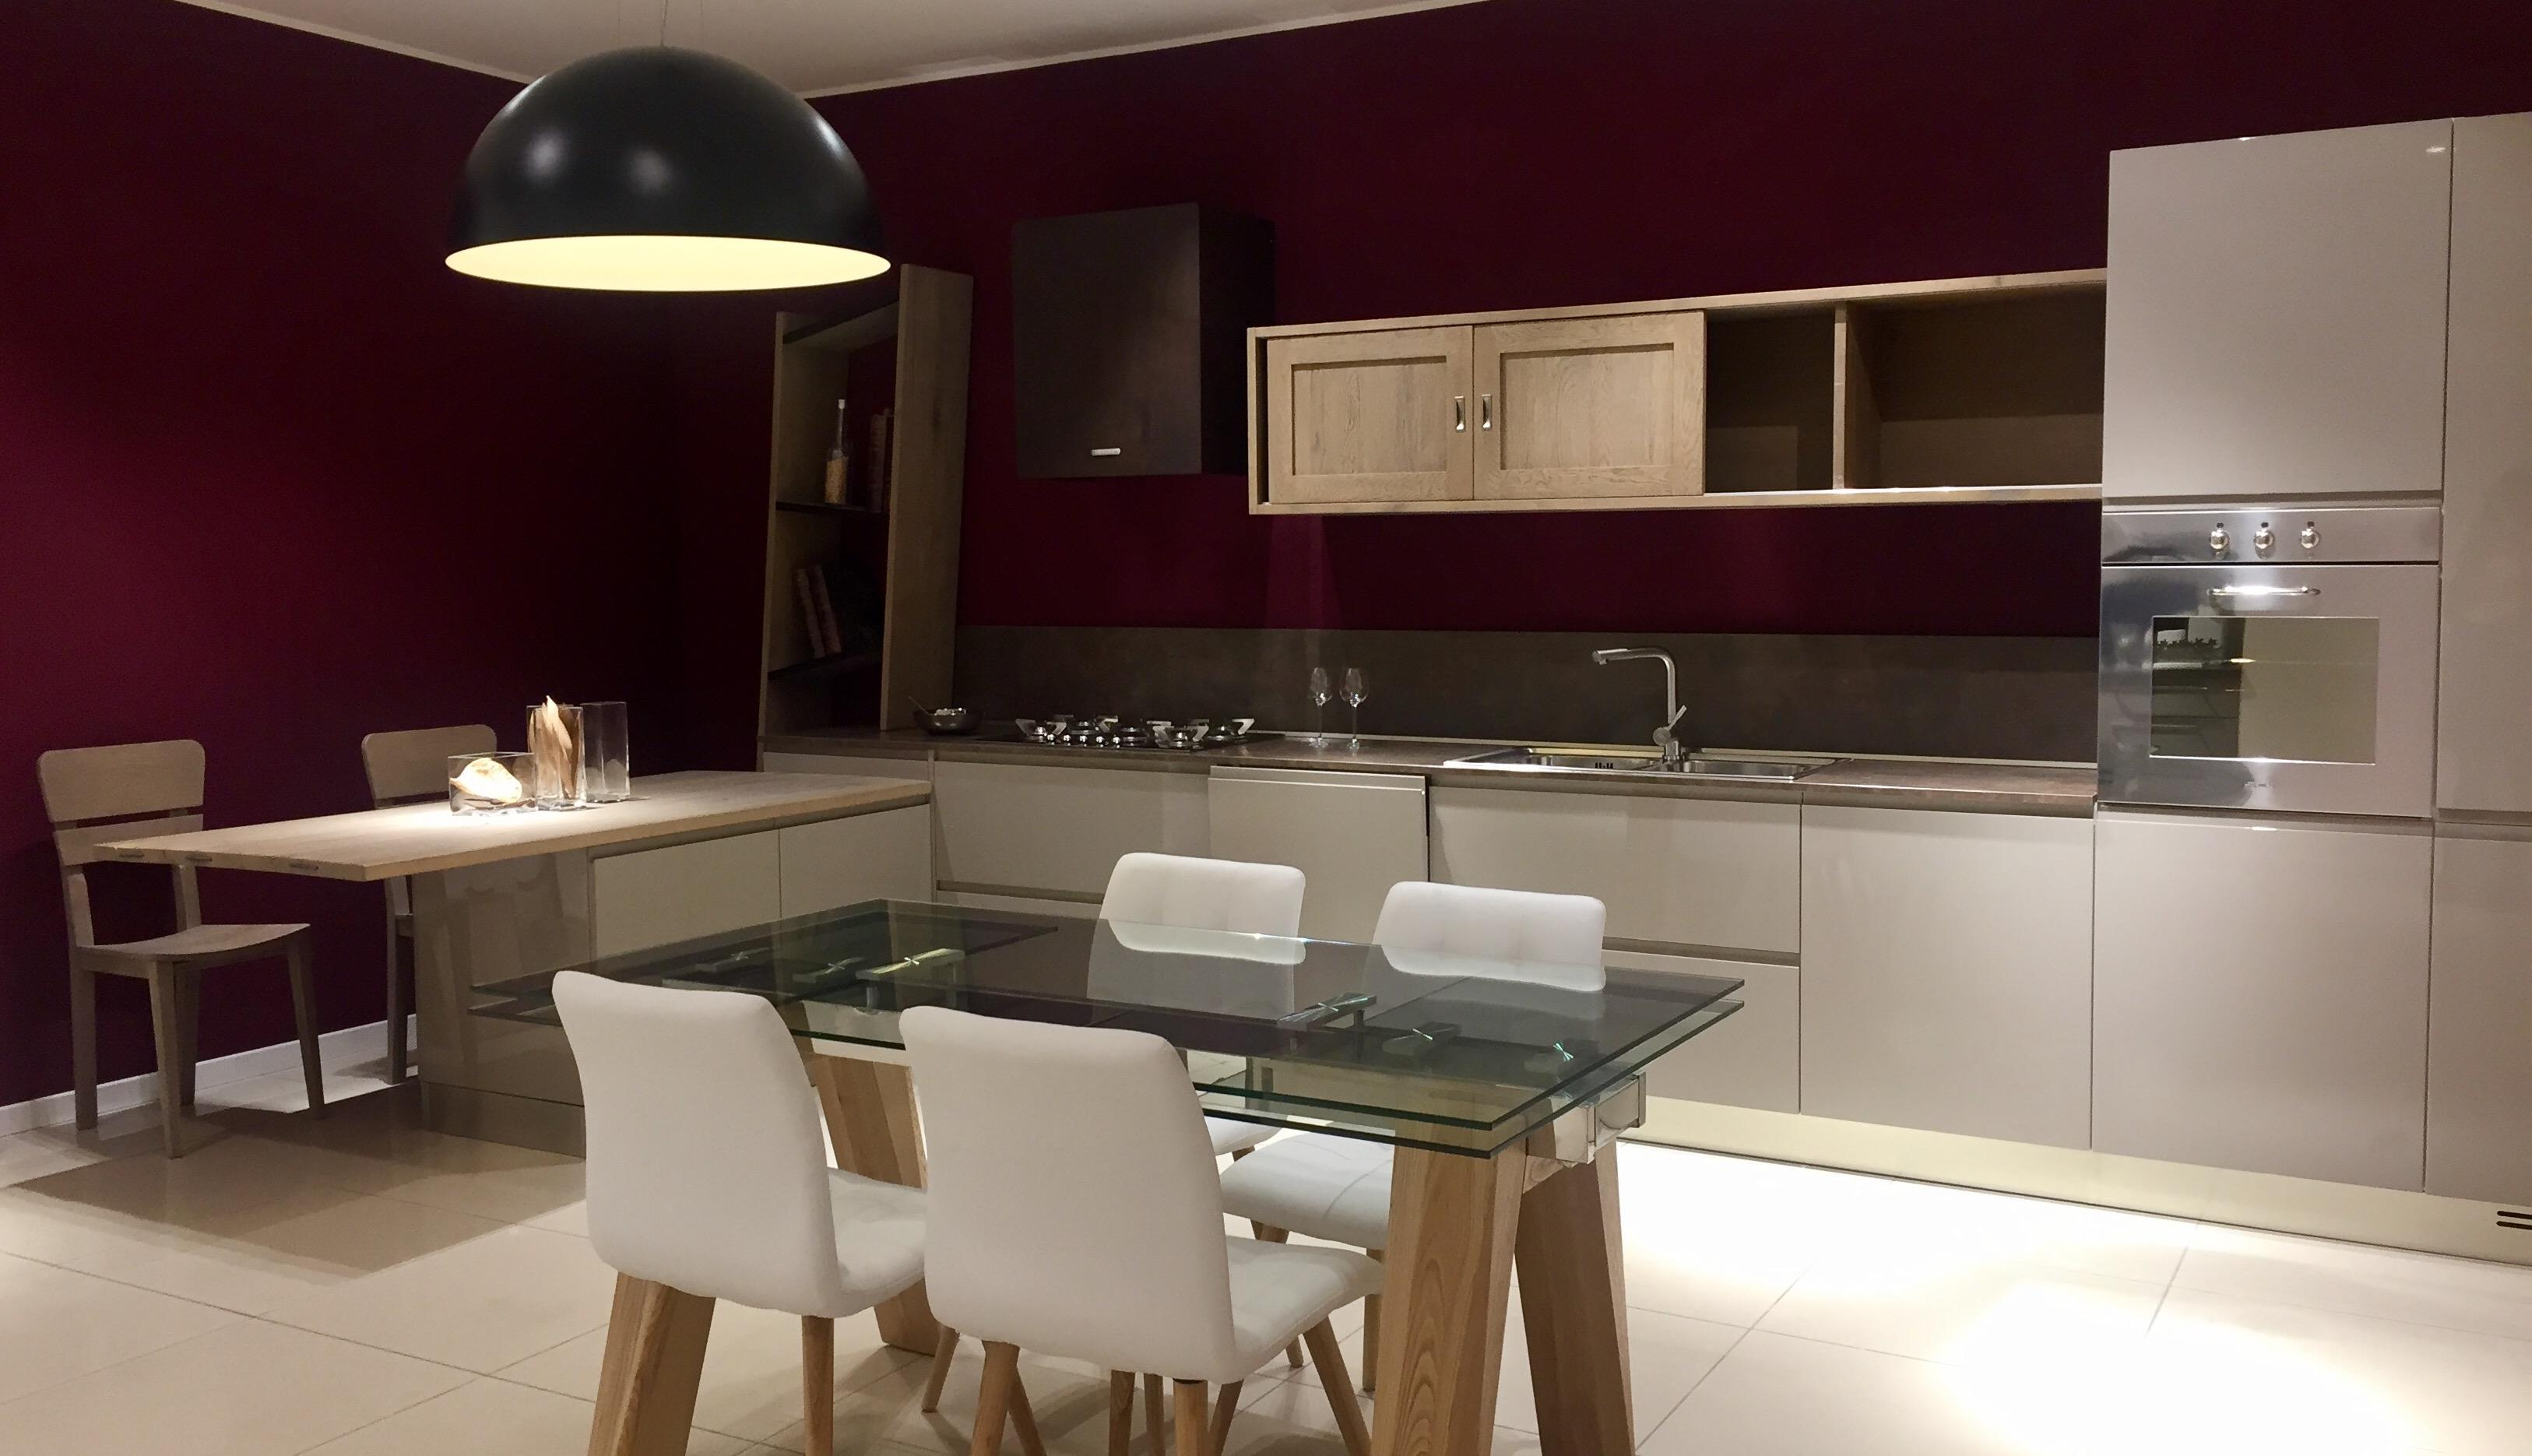 Cucina moderna modello milano cucine a prezzi scontati for Cucina usata a milano